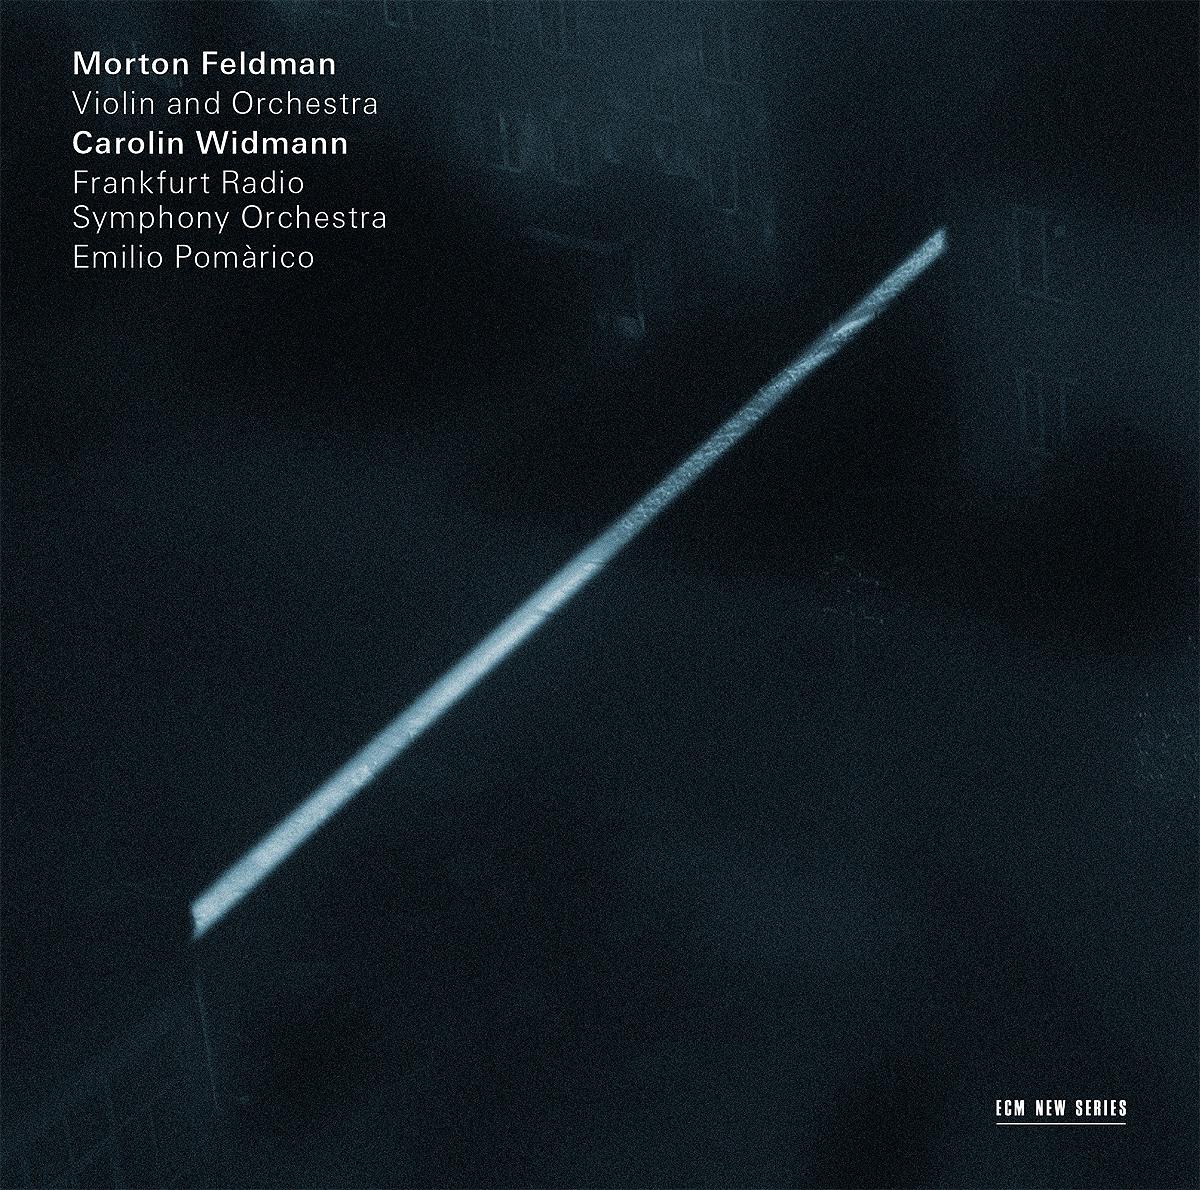 Carolin Widmann. M.Feldman: Violin And Orchestra carolin wufka akquisitionscontrolling